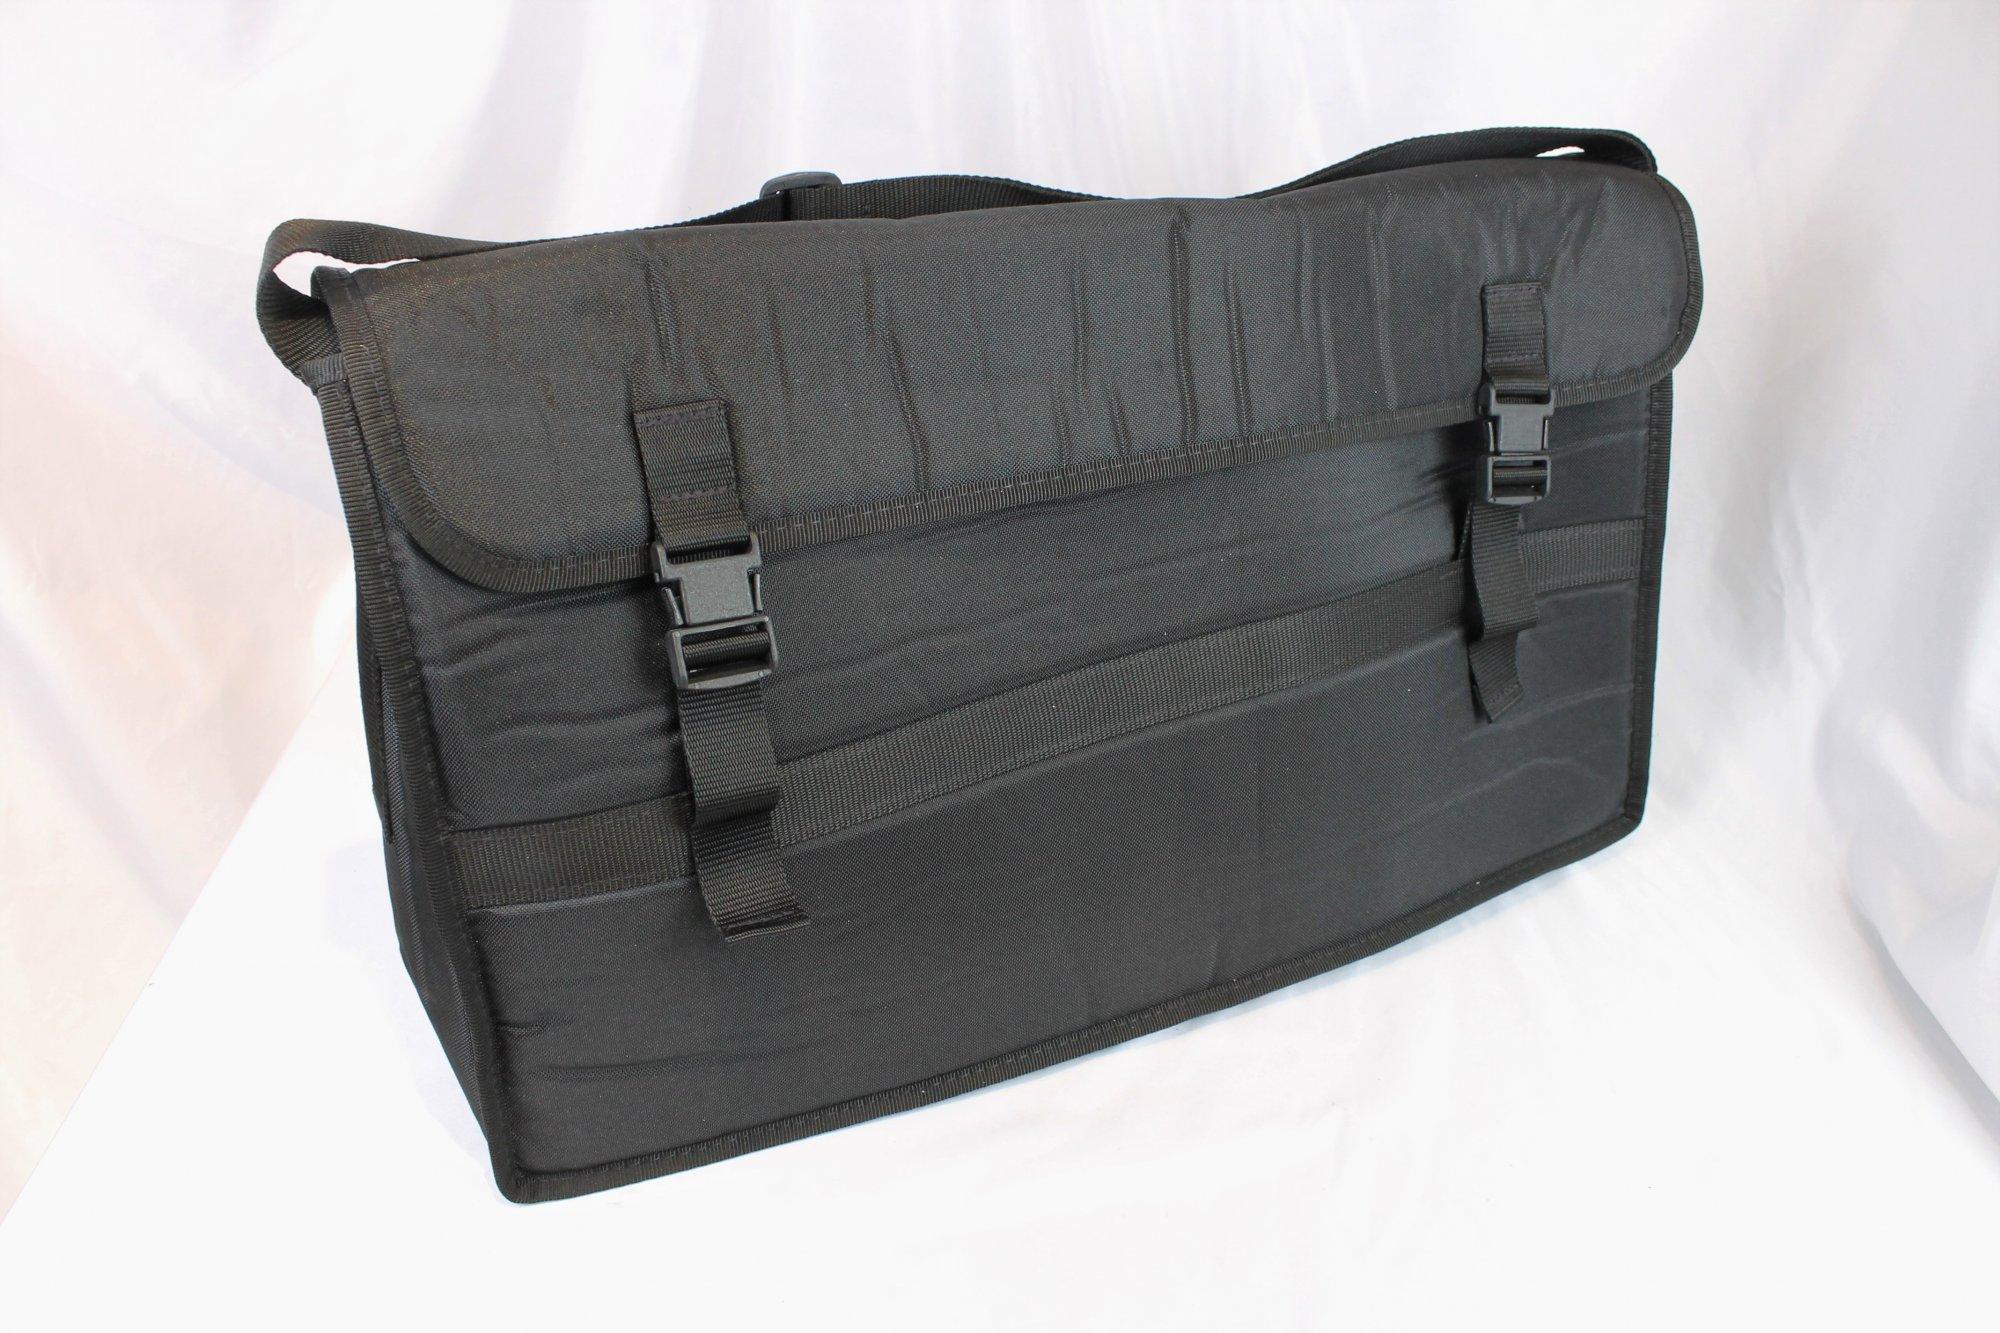 NEW Black Fuselli Soft Case Gig Bag for Midi Expander 24 x 13 x 3 - Fits Orla Midi Sound Modules